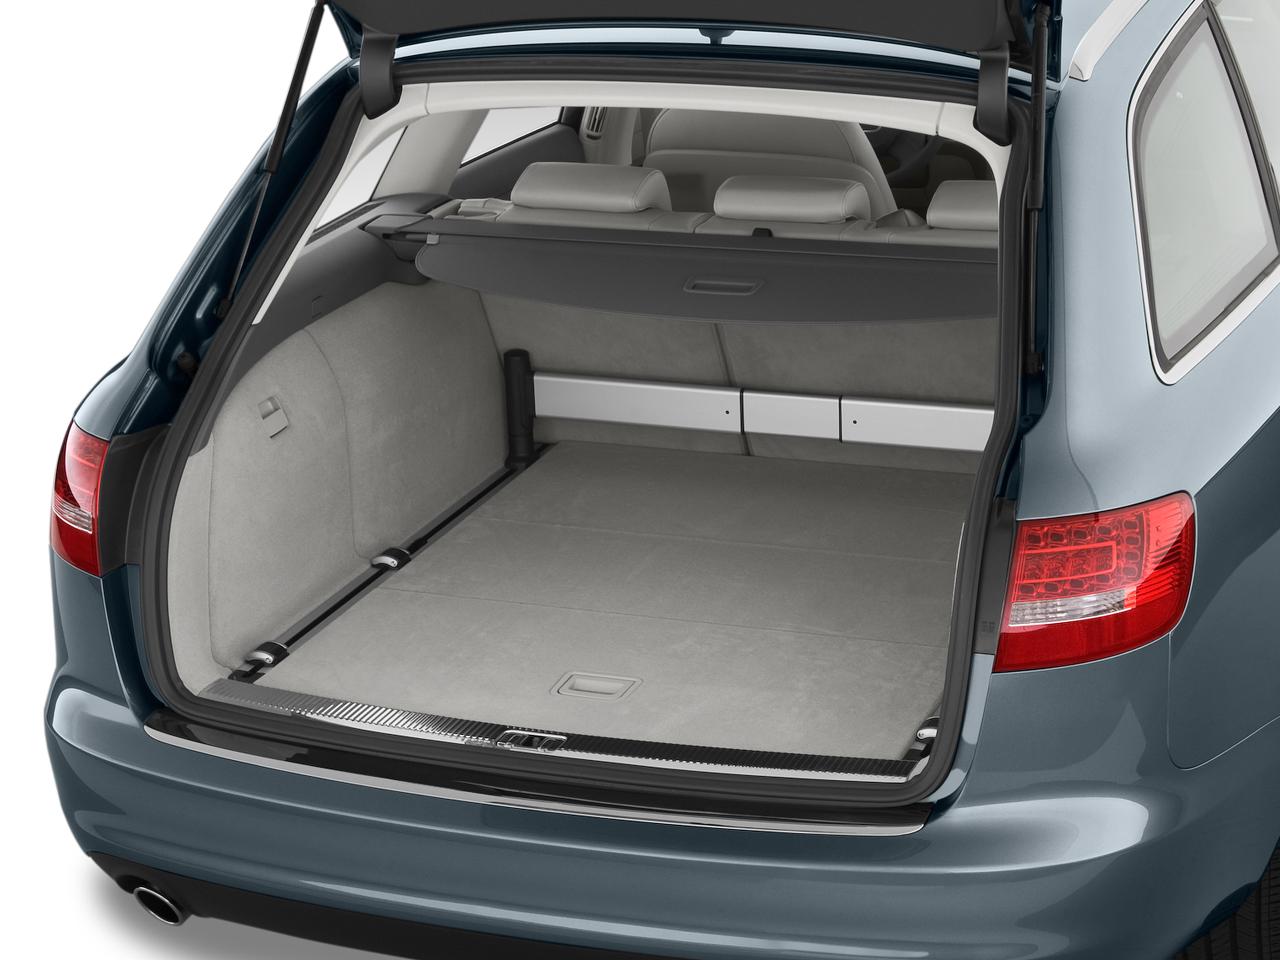 2009 Audi A6 Wagon For Sale The Wagon